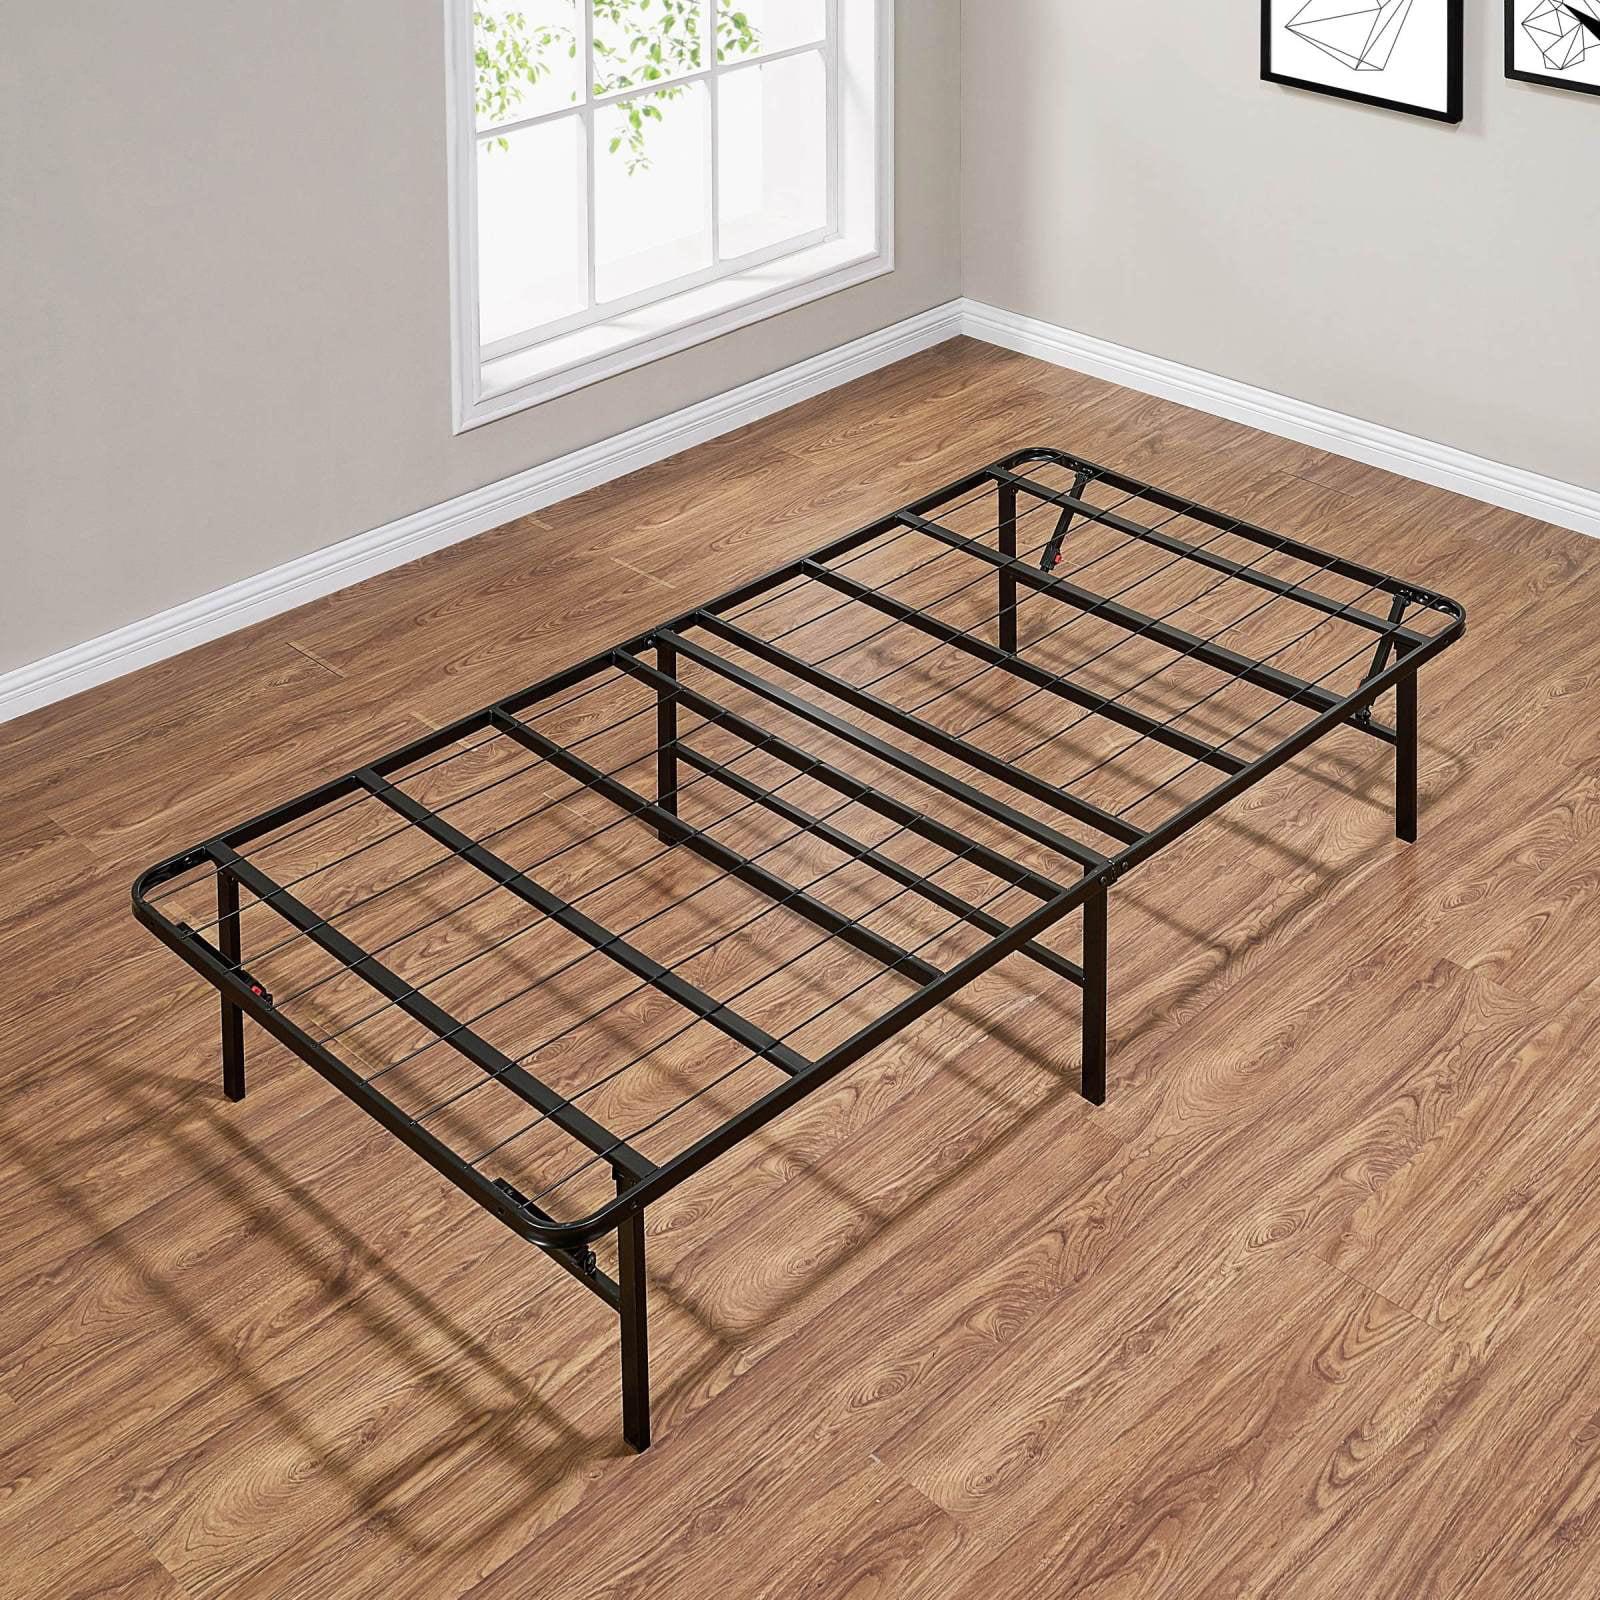 Image of: Mainstays 14 High Profile Foldable Steel Bed Frame Powder Coated Steel Twin Walmart Com Walmart Com